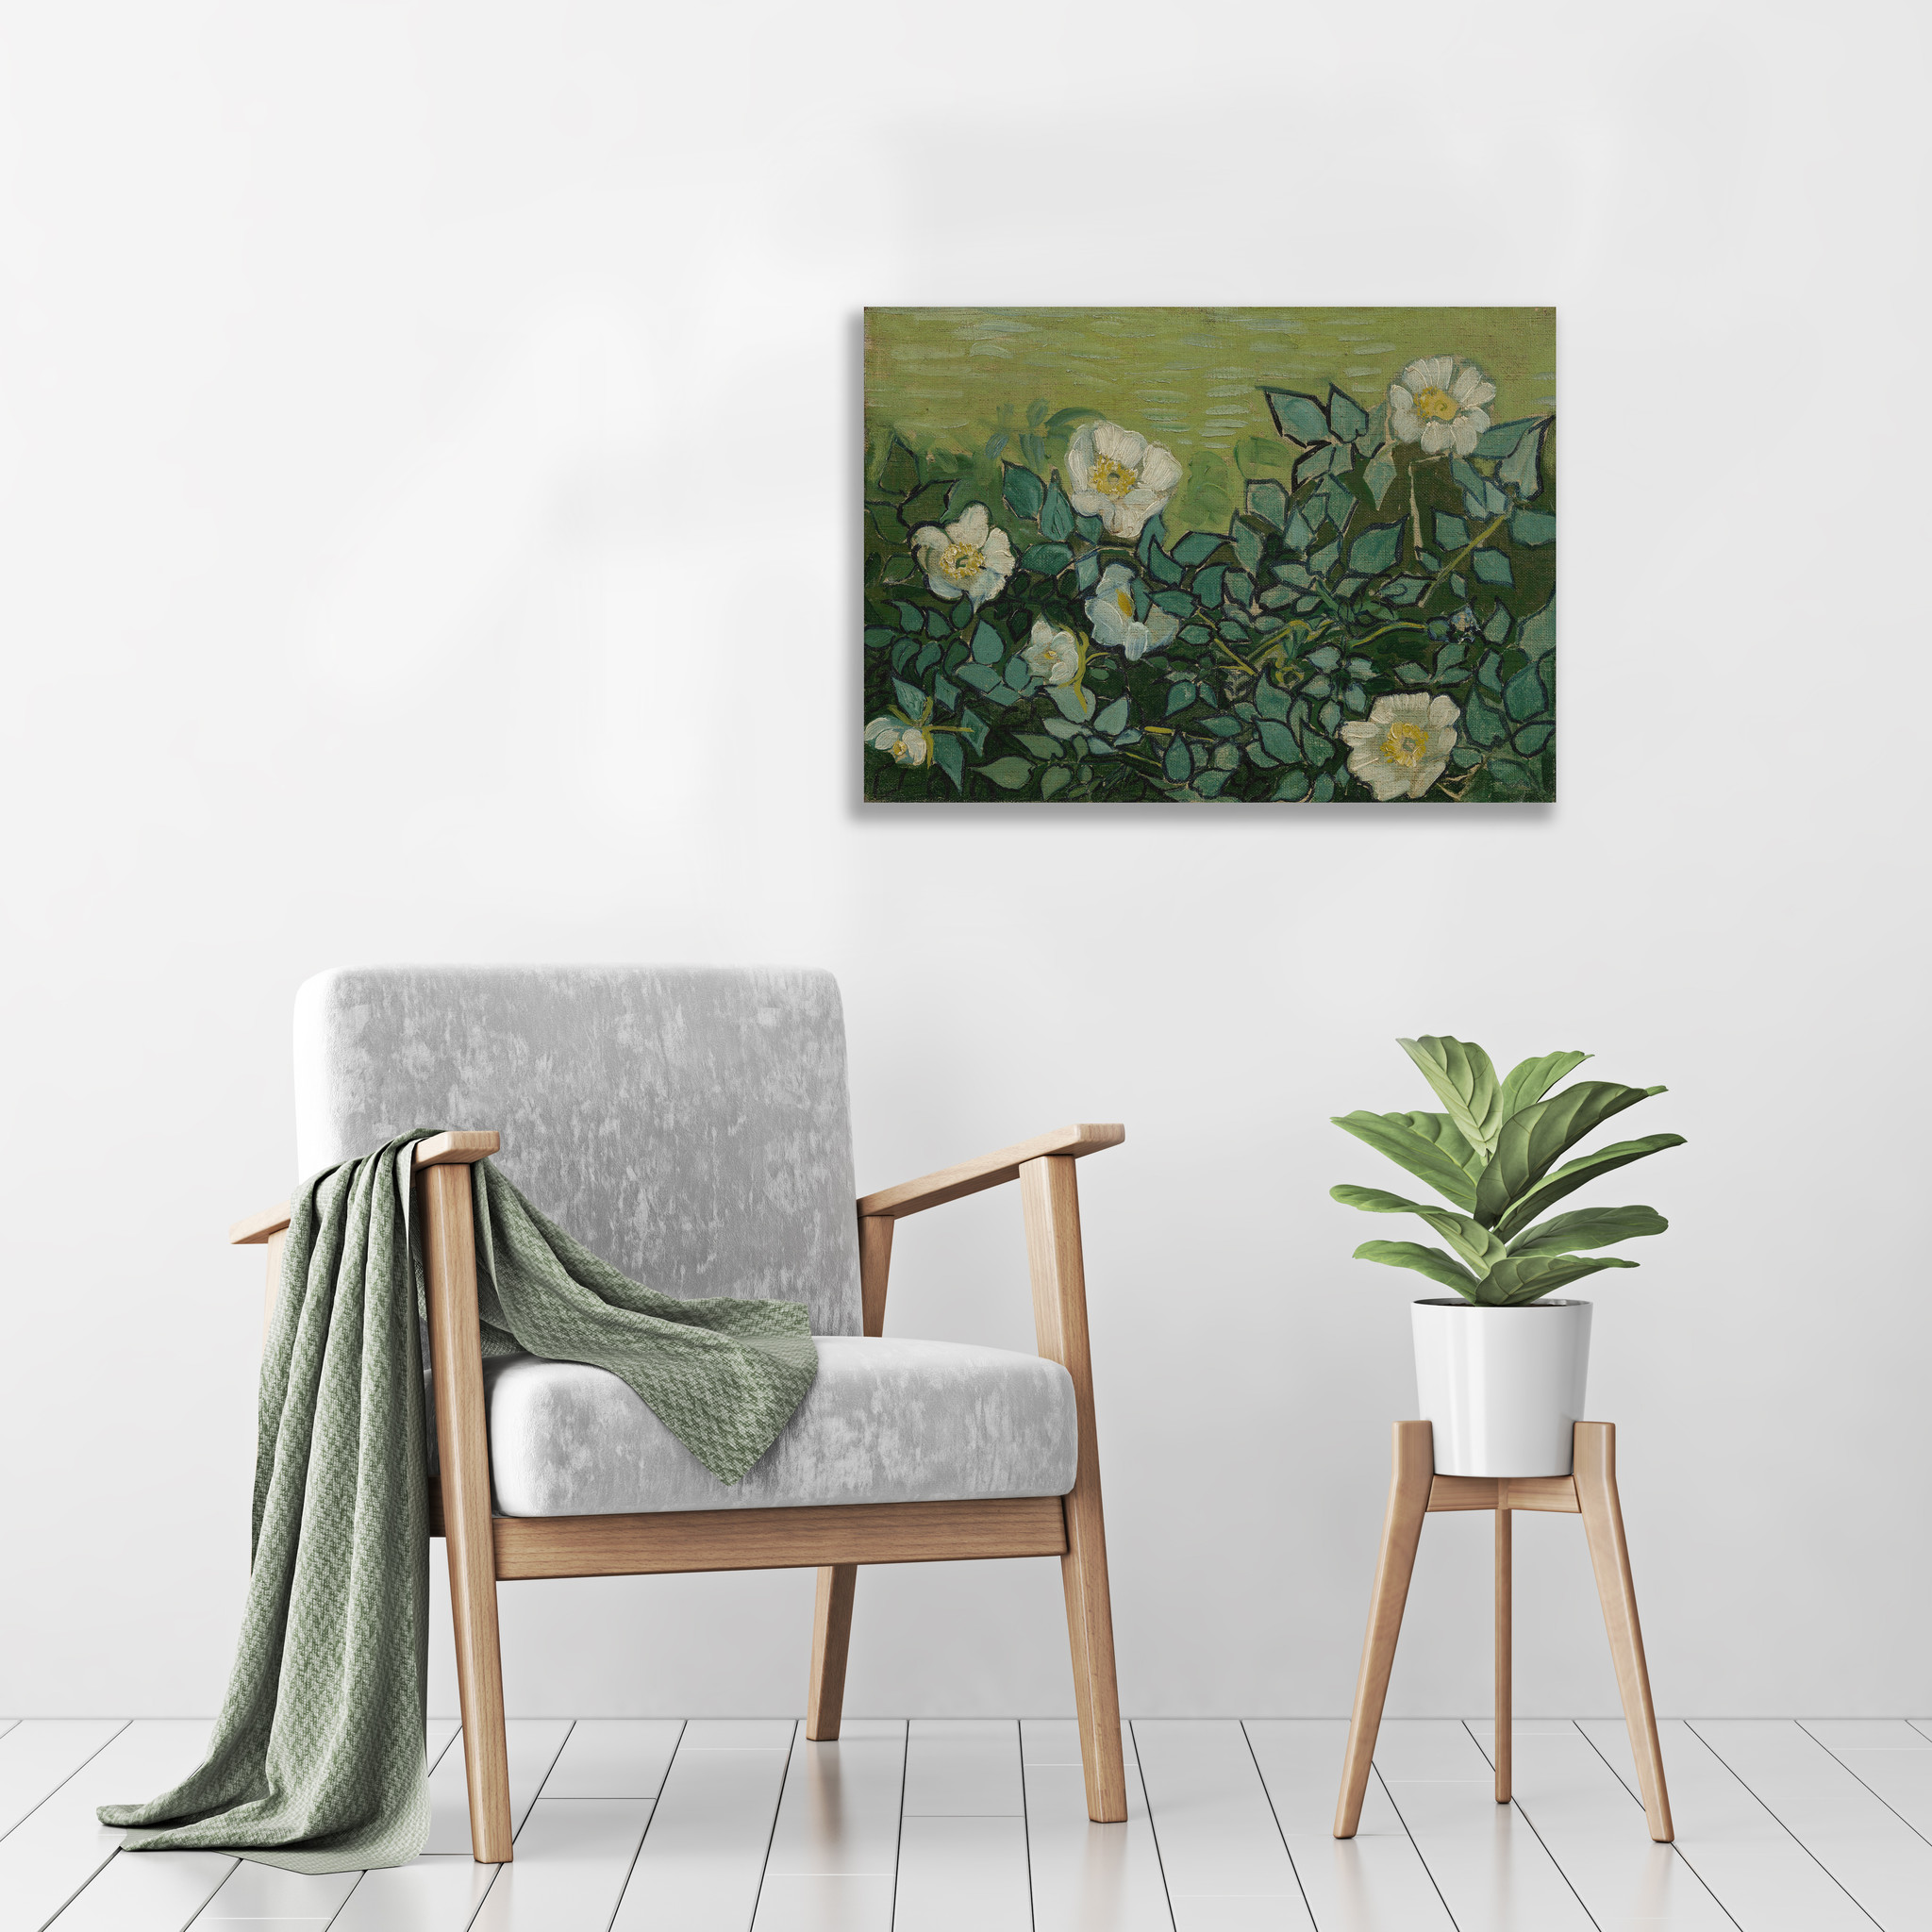 Wilde Rozen - Van Gogh - op Plexiglas